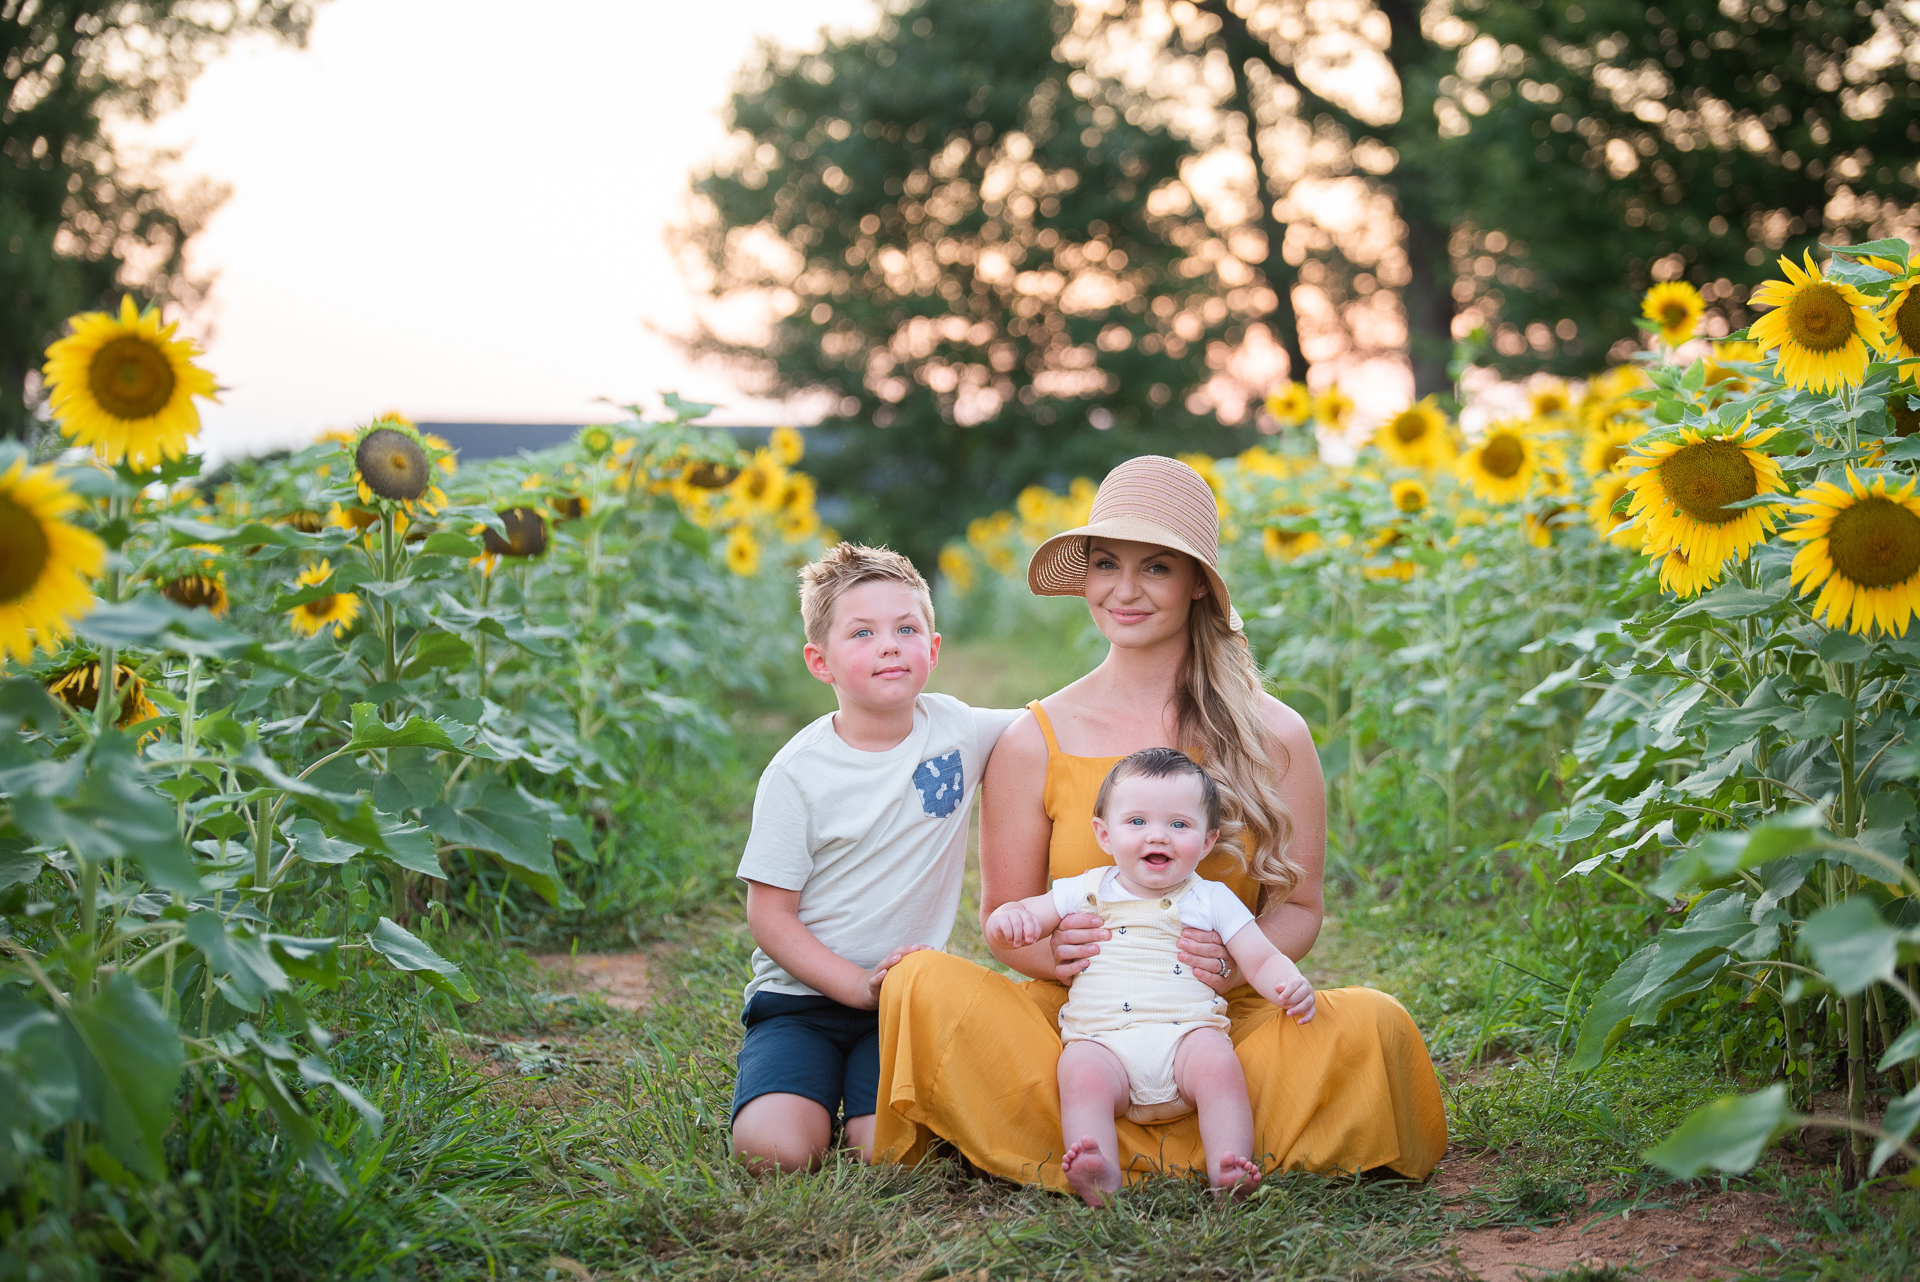 Sunflower fields near me - Sunflower field photos by Yasmin Leonard Photography, NC family photographer - Misty Nelson family photos, blogger @frostedevents